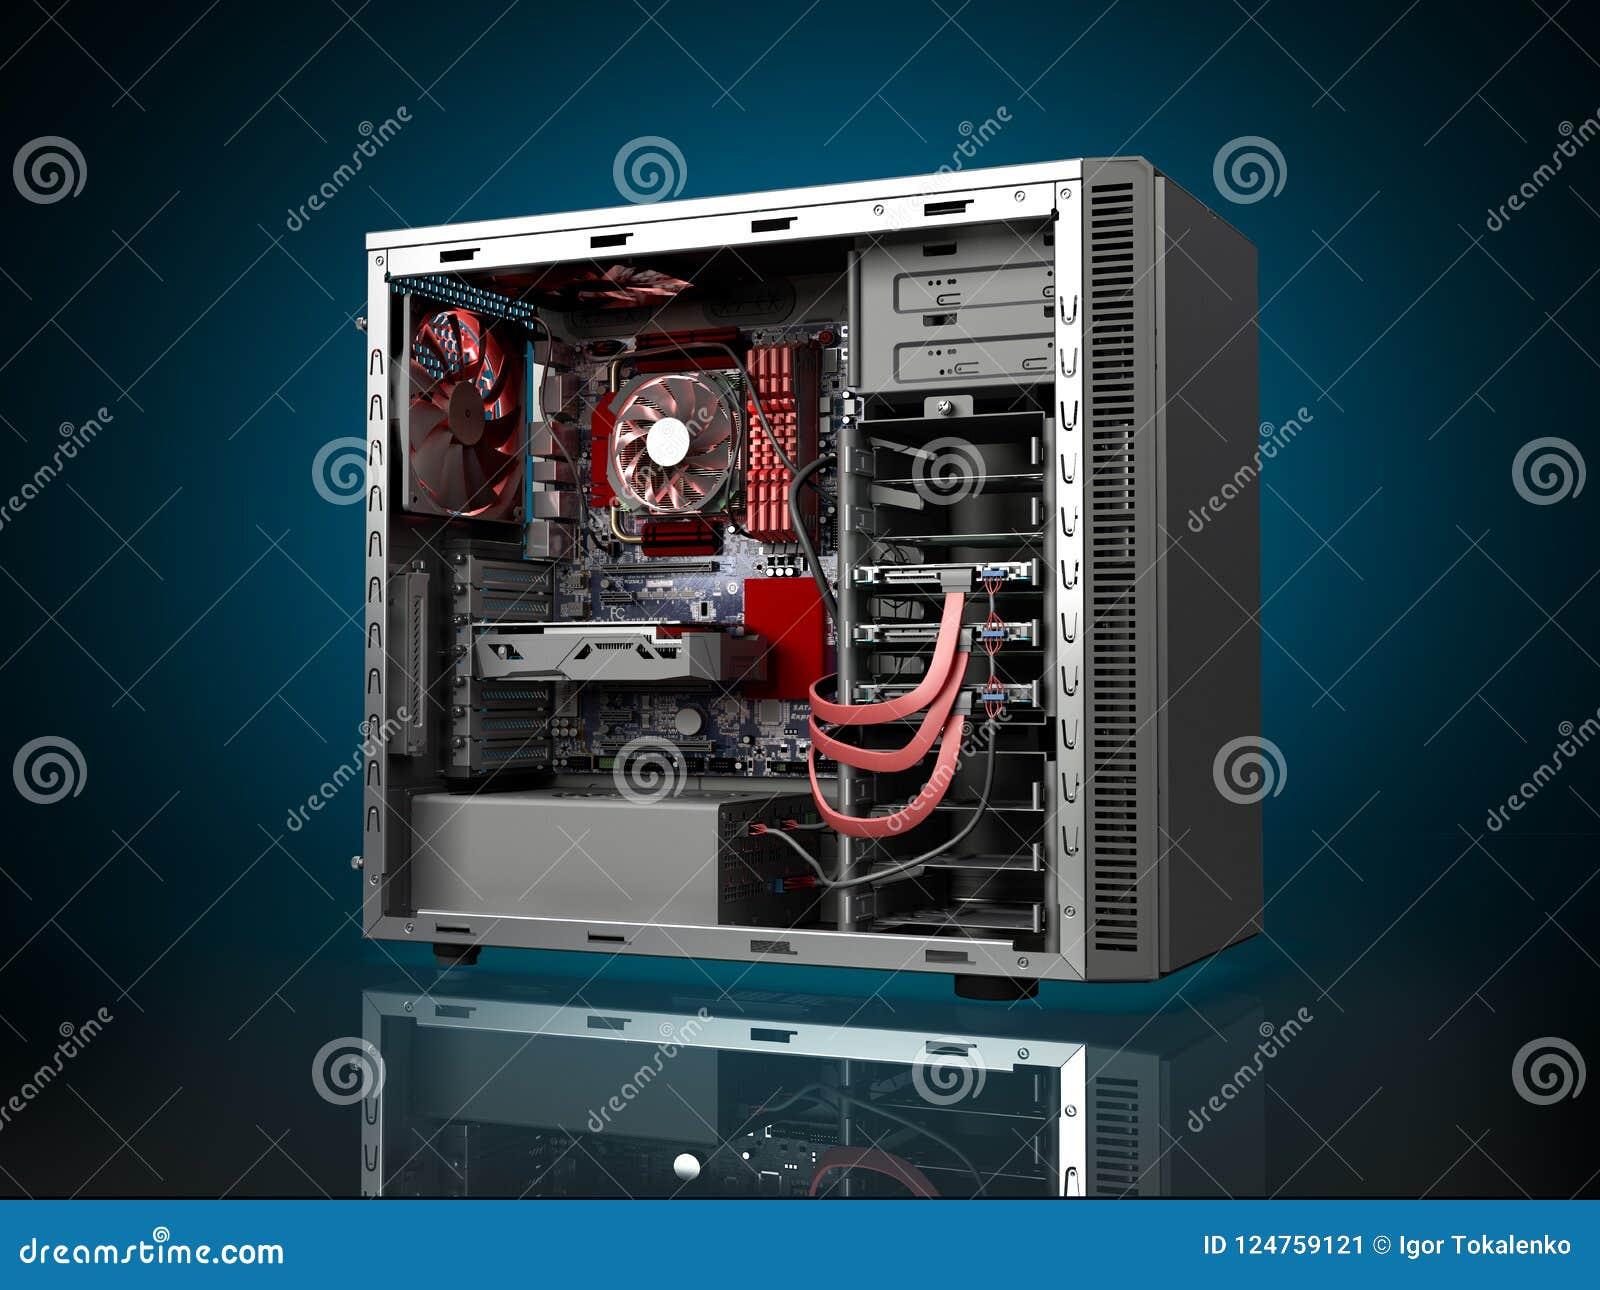 Open pc computer case stock photo. Image of chip, desktop 35334488.